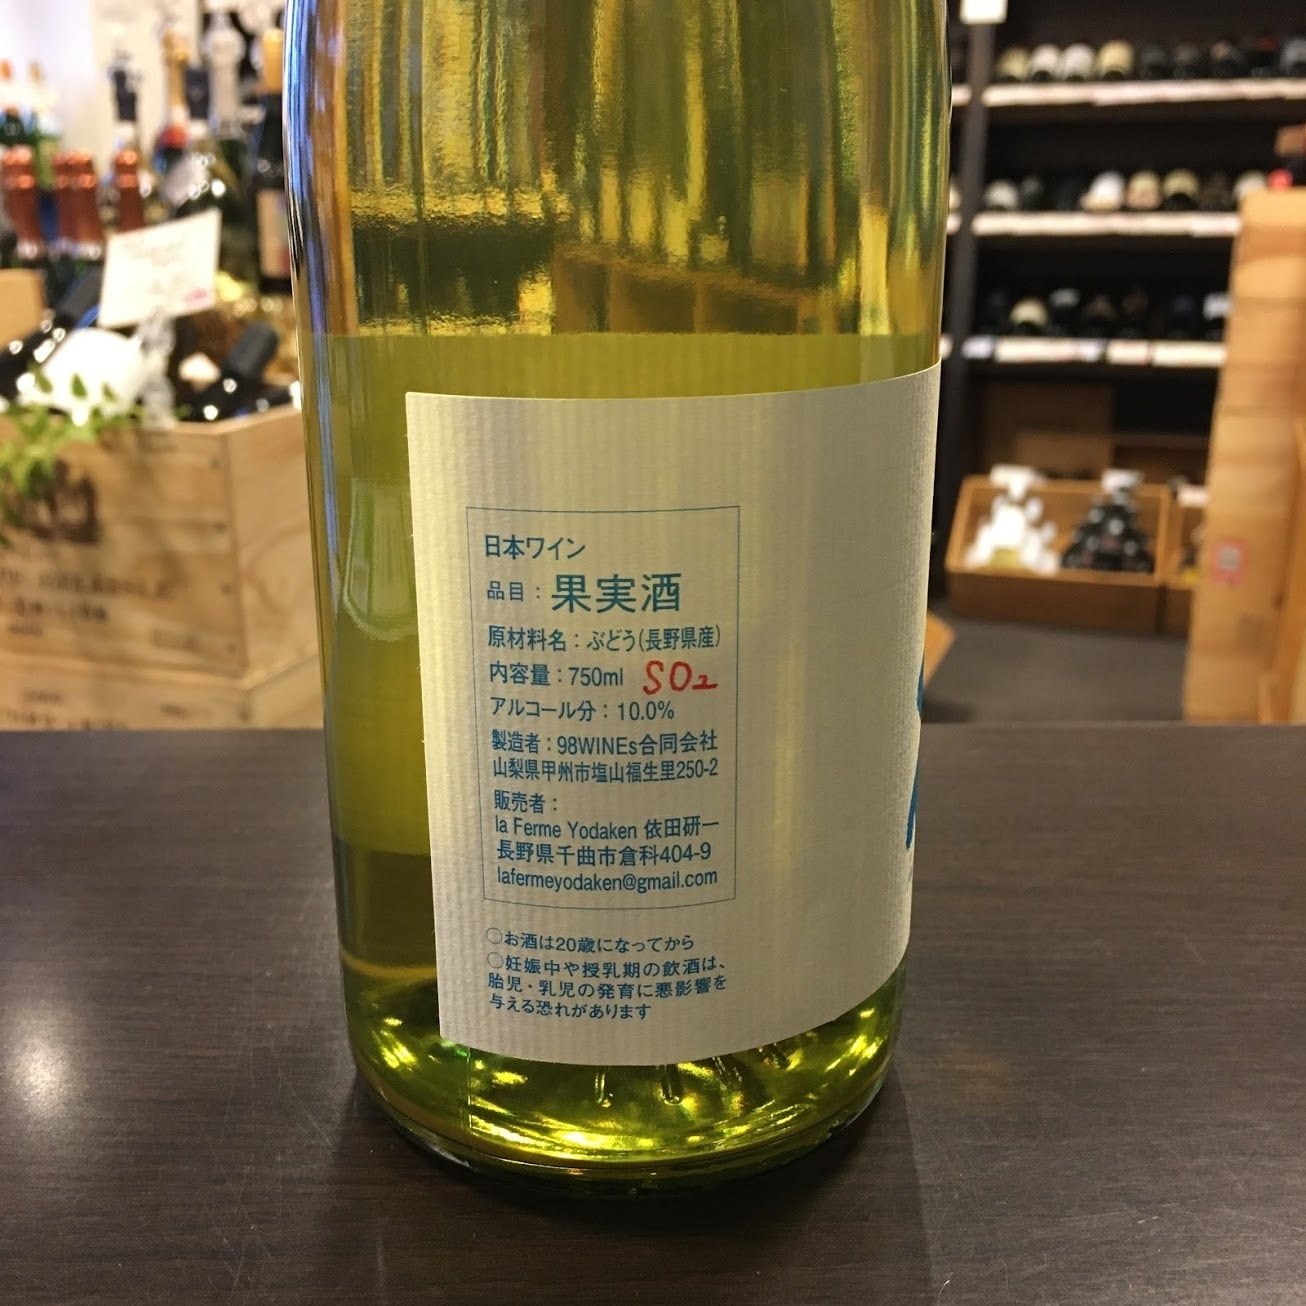 AOSORA 2019(瓶詰時に亜硫酸塩30ppm)